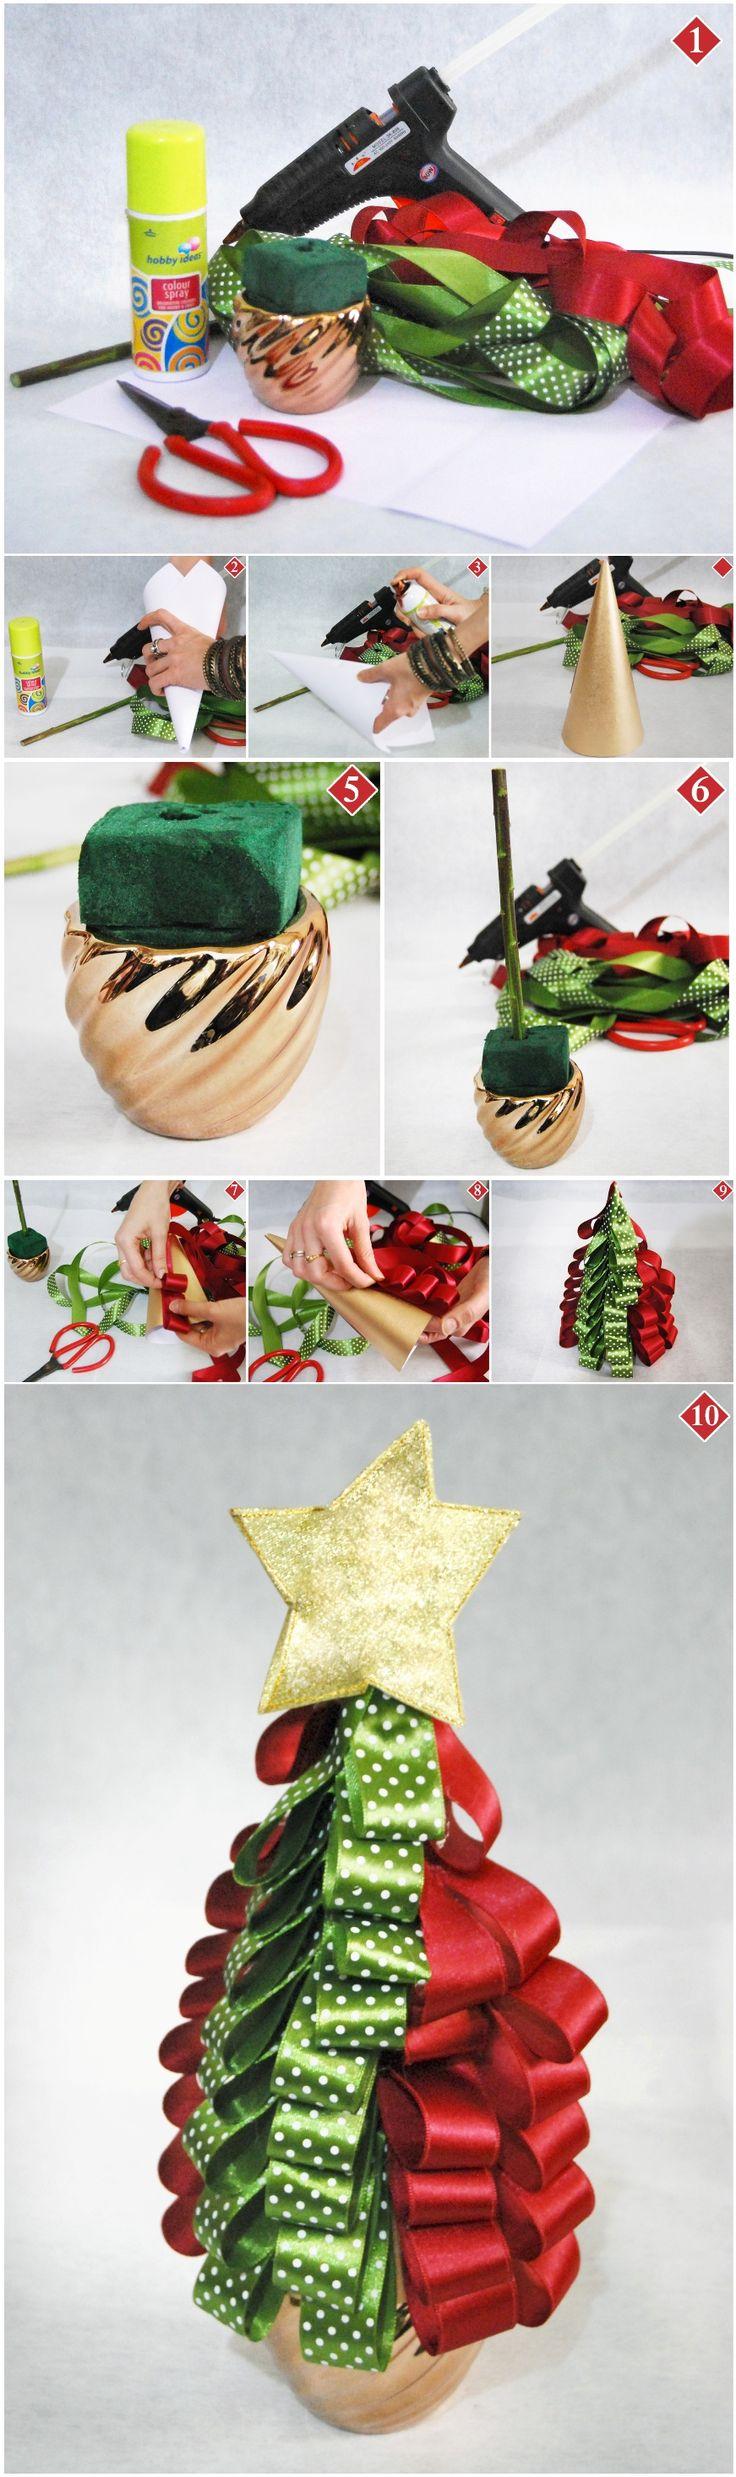 #DIY: Mini Christmas Tree